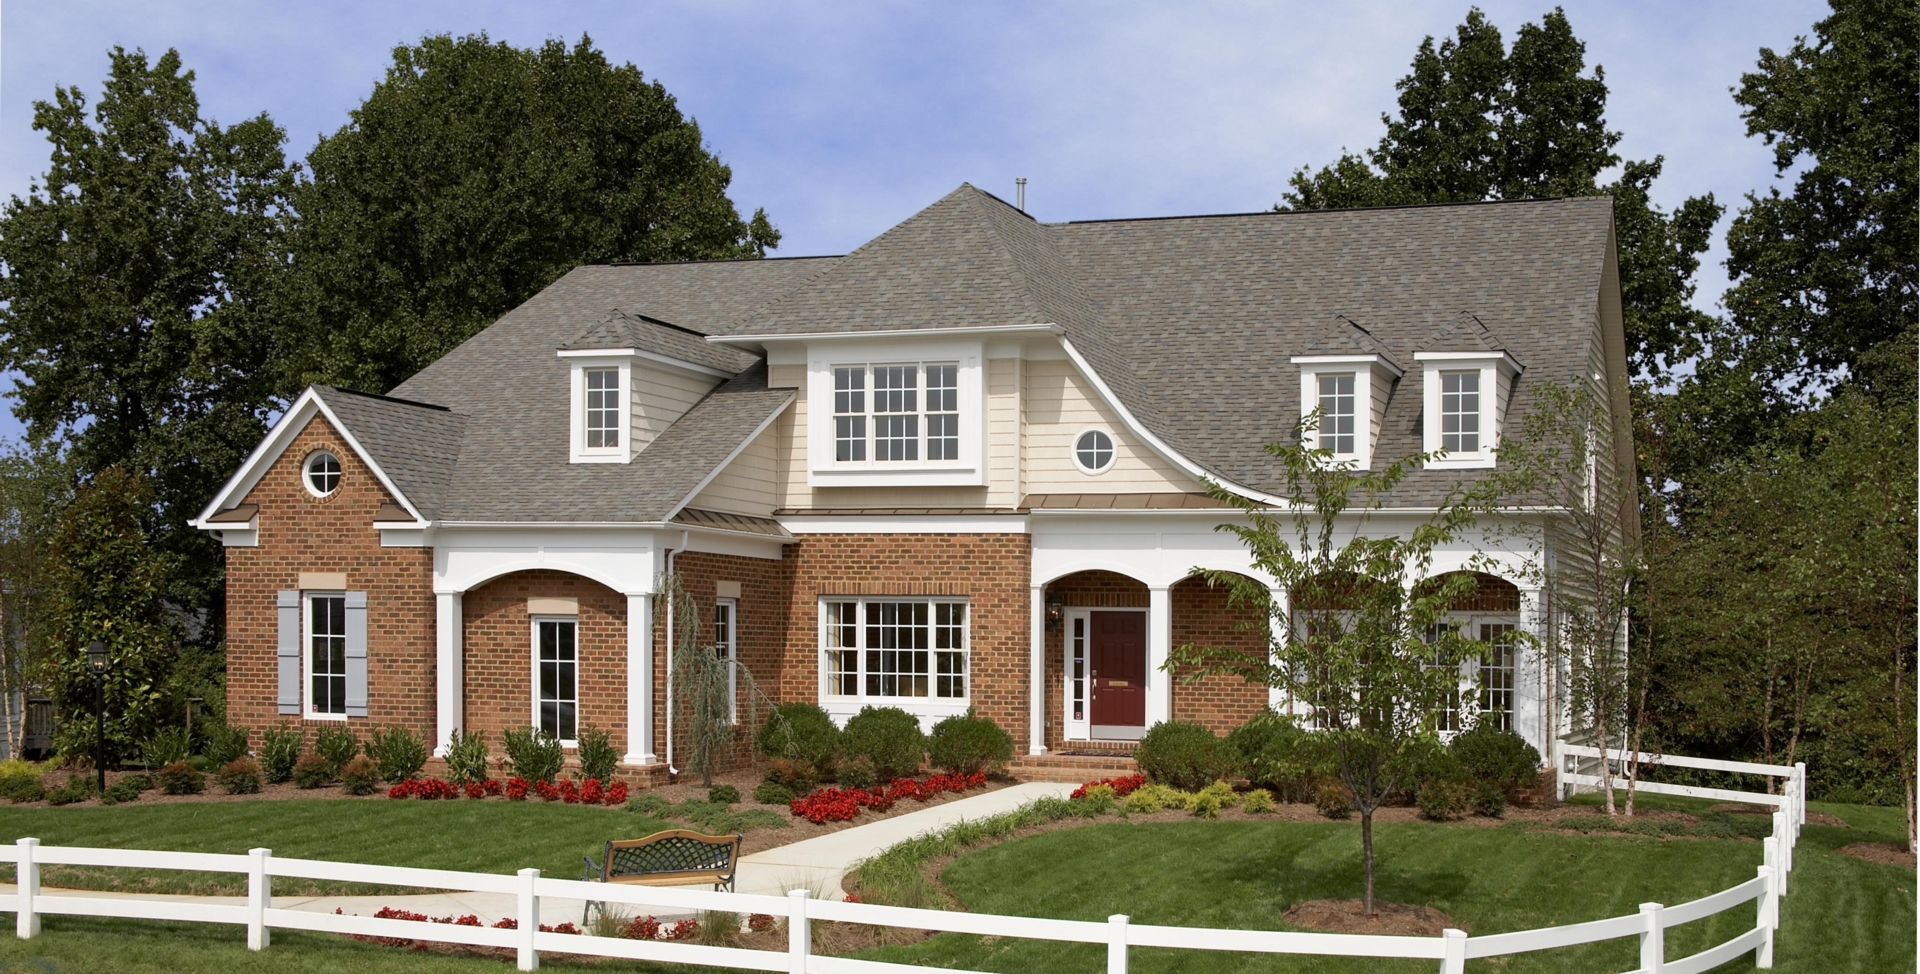 Single family home in md va toscana mid atlantic for Mid atlantic home builders